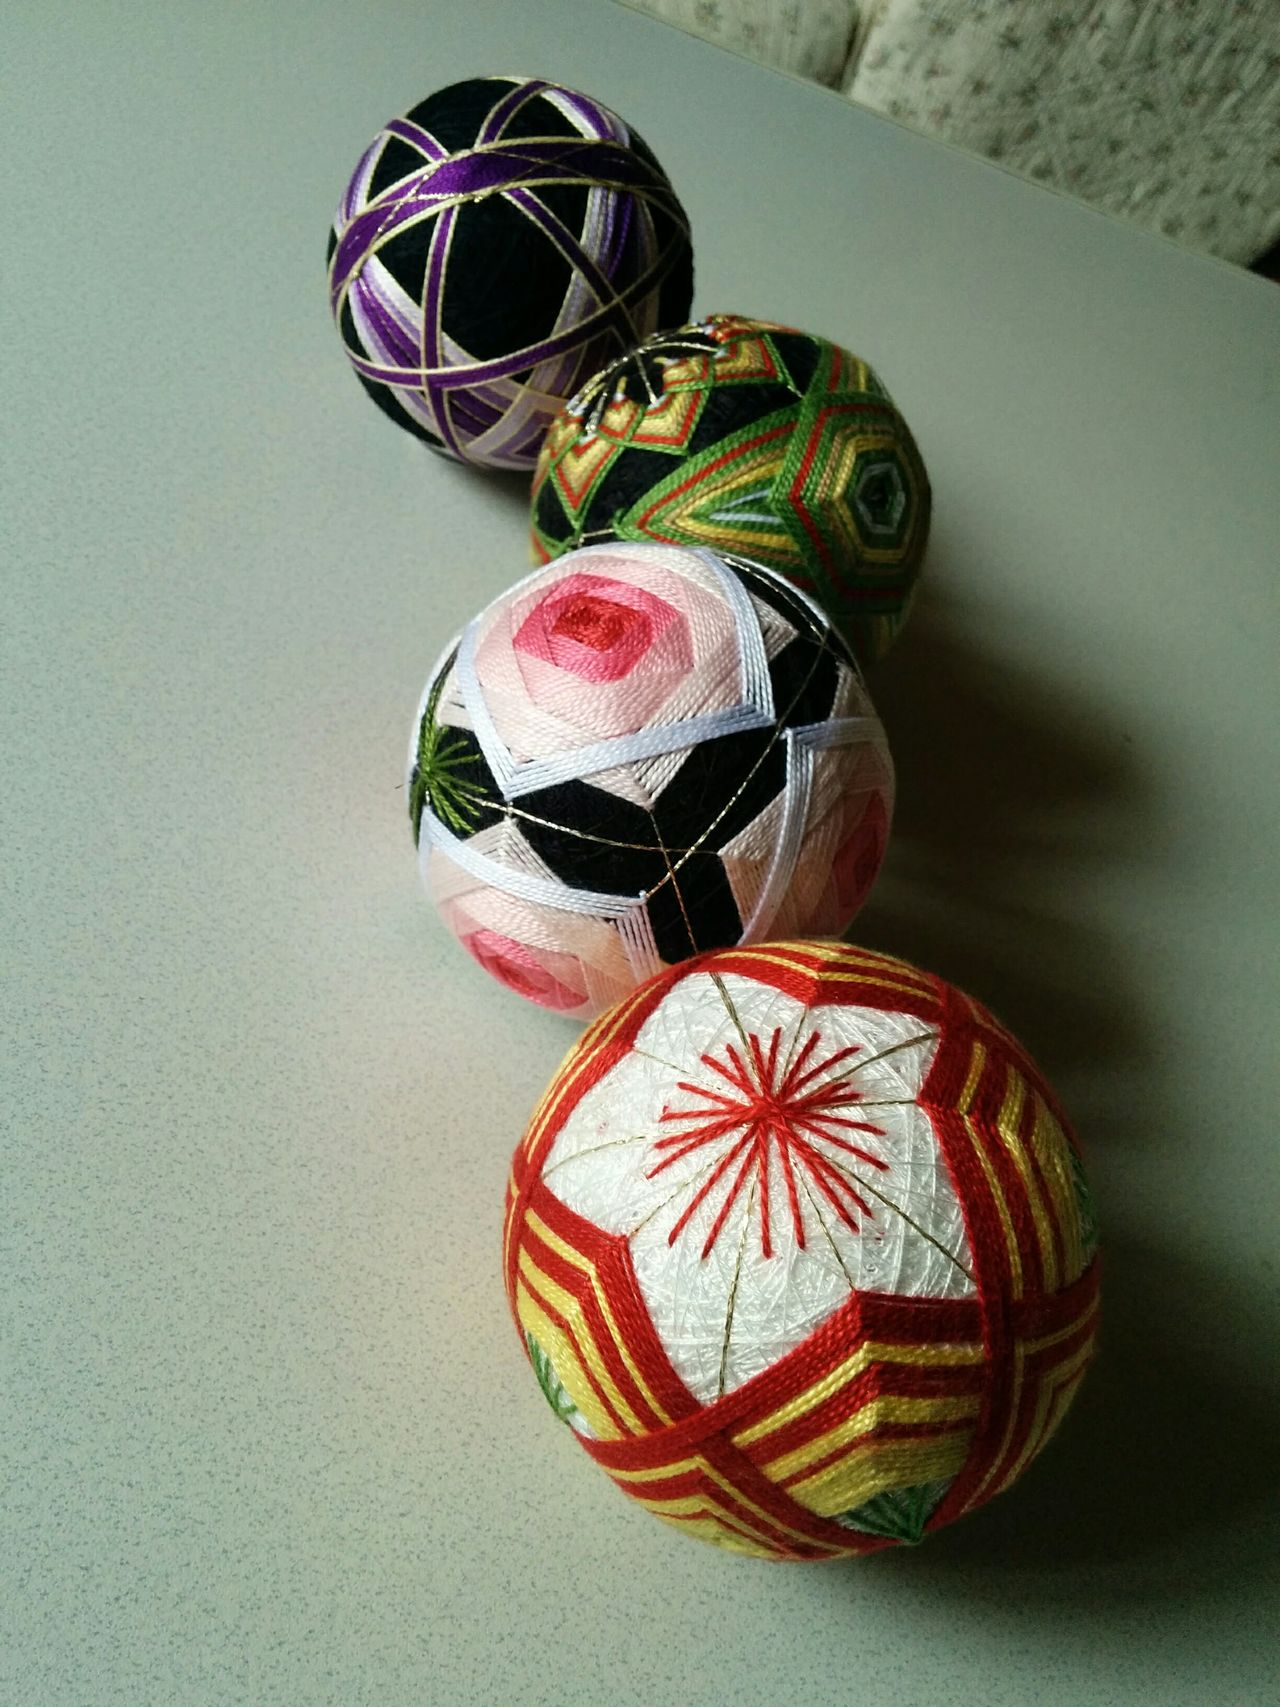 Ball Handmade Japan Japanese Culture Multi Colored Temari 手まり寿司 手毬 First Eyeem Photo